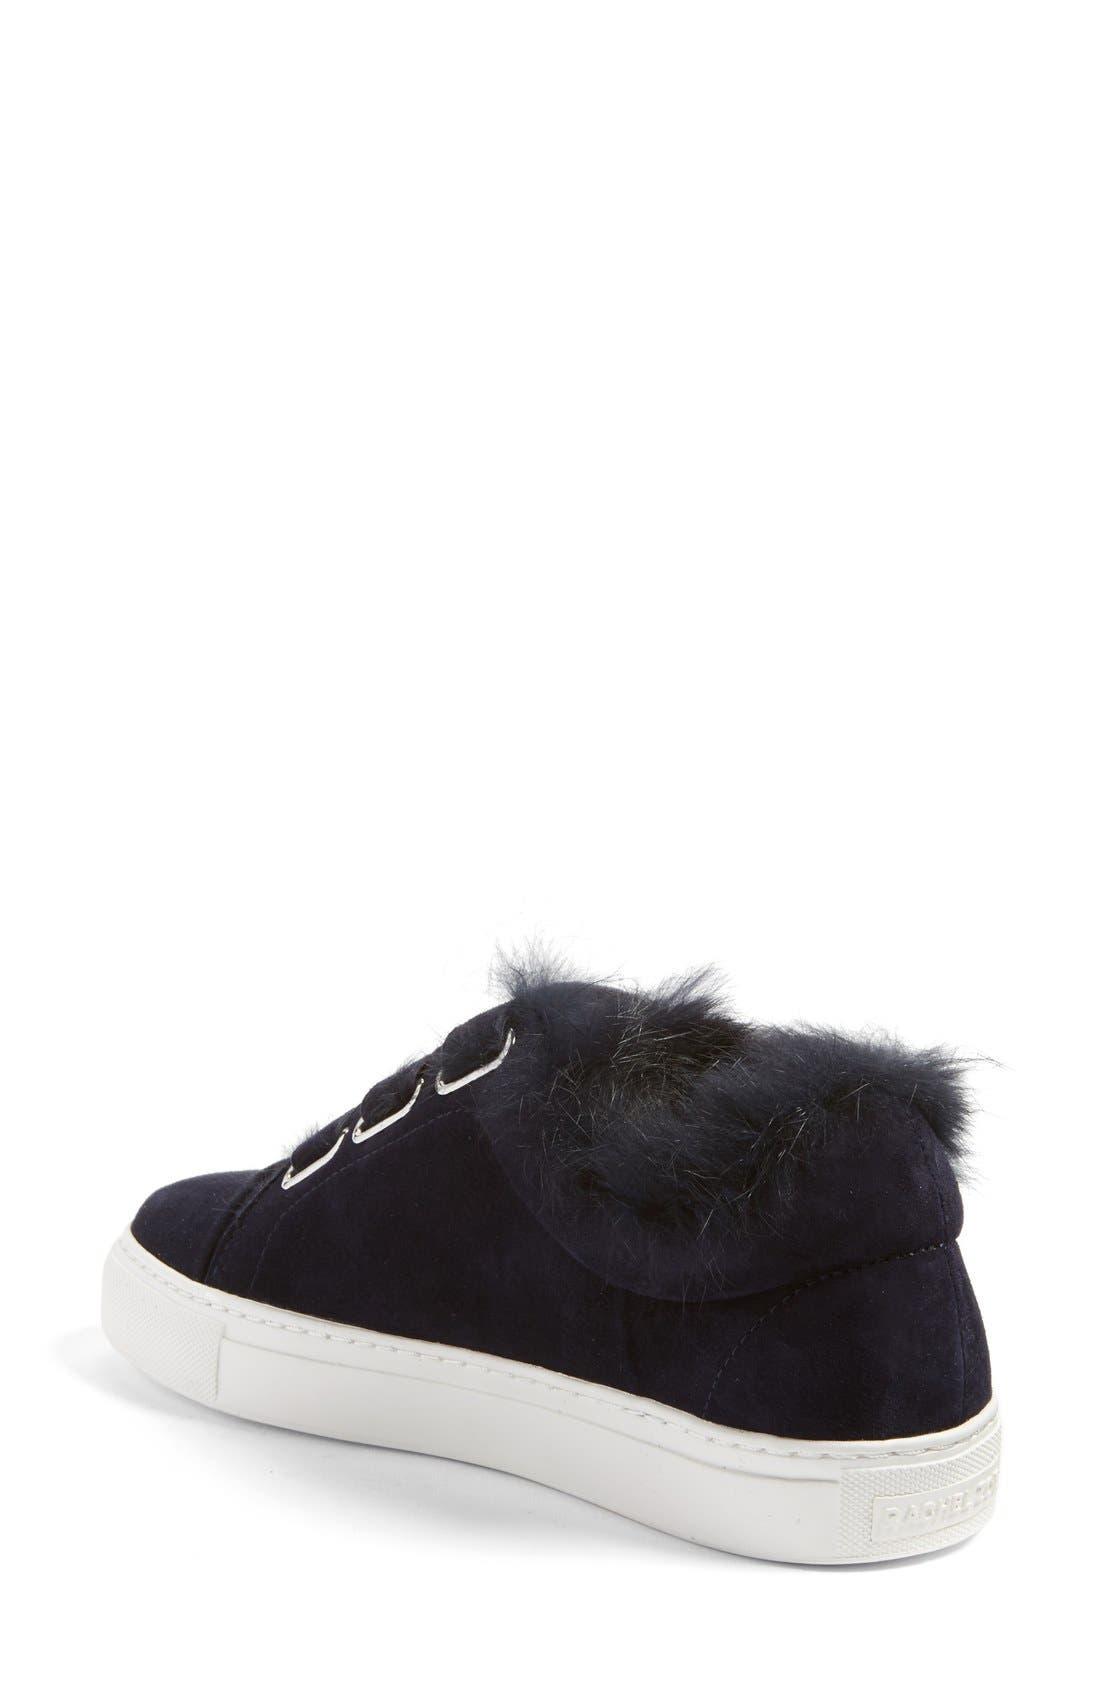 'Boe' Genuine Rabbit Fur & Shearling Lined Platform Sneaker,                             Alternate thumbnail 4, color,                             425